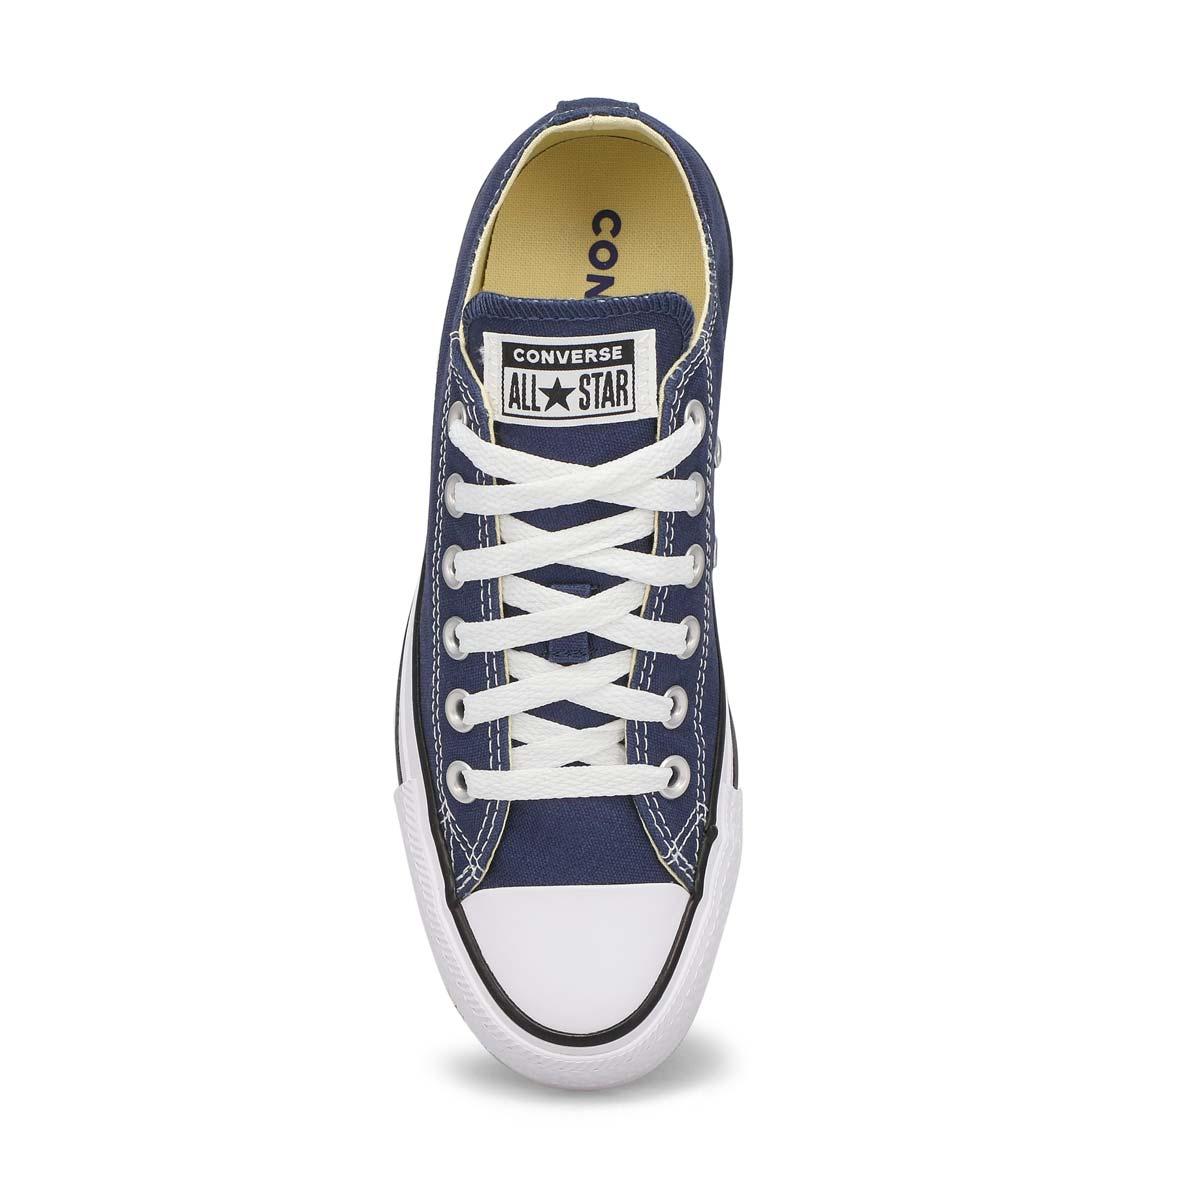 Women's Chuck Taylor All Star Sneaker - Navy